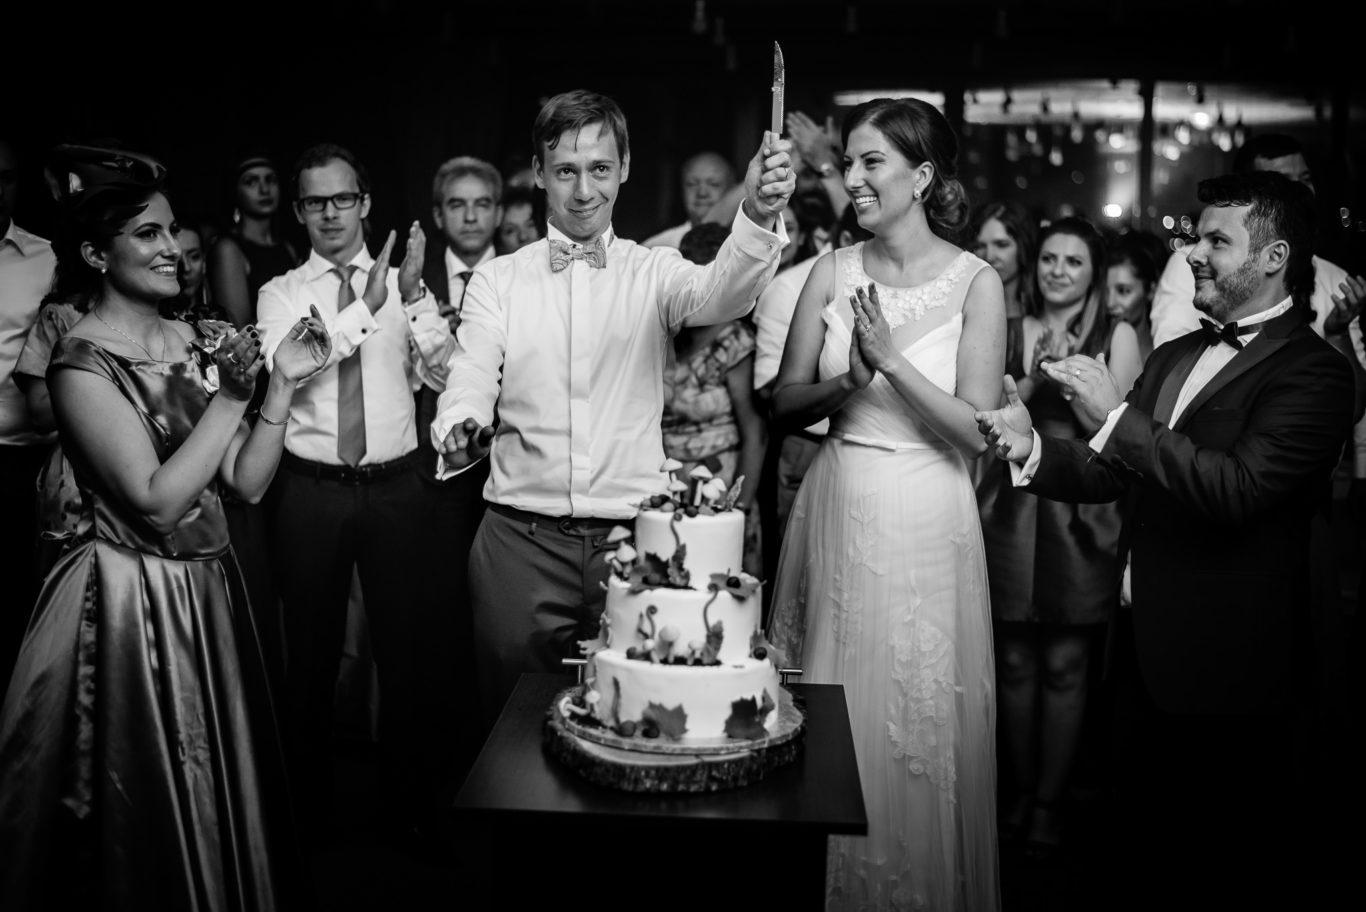 0878-Fotografie-nunta-Bucuresti-Oana-Catalin-fotograf-Ciprian-Dumitrescu-DSC_5872